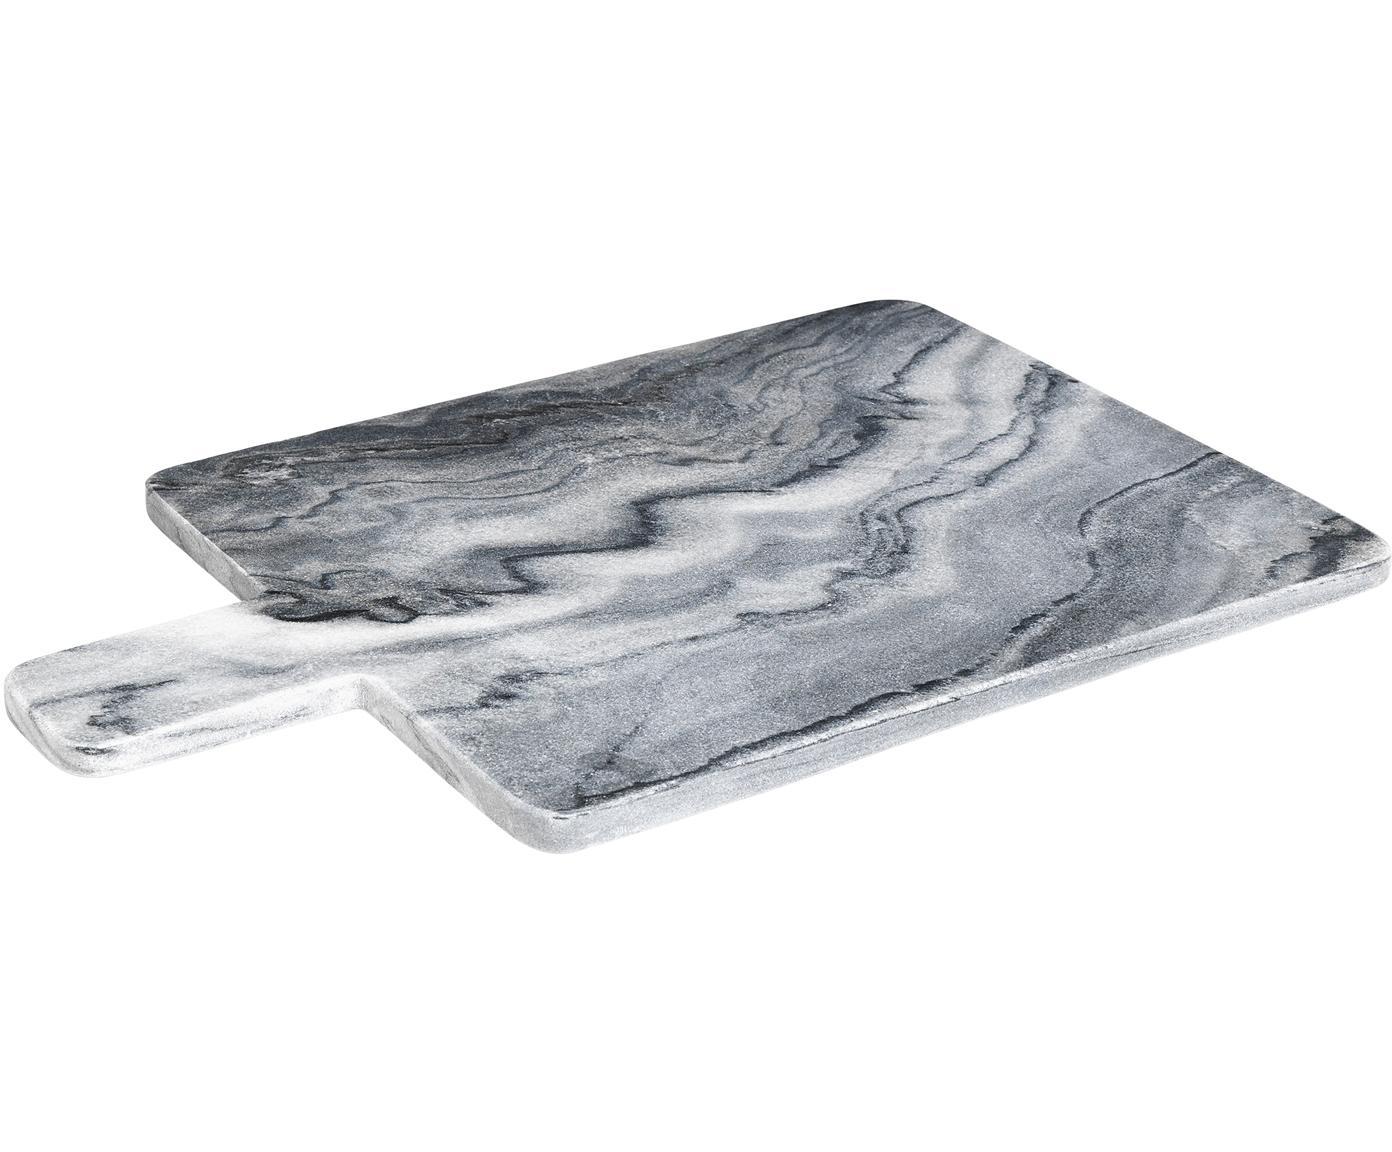 Marmor-Schneidebrett Adam, Marmor, Grau, B 45 x T 30 cm